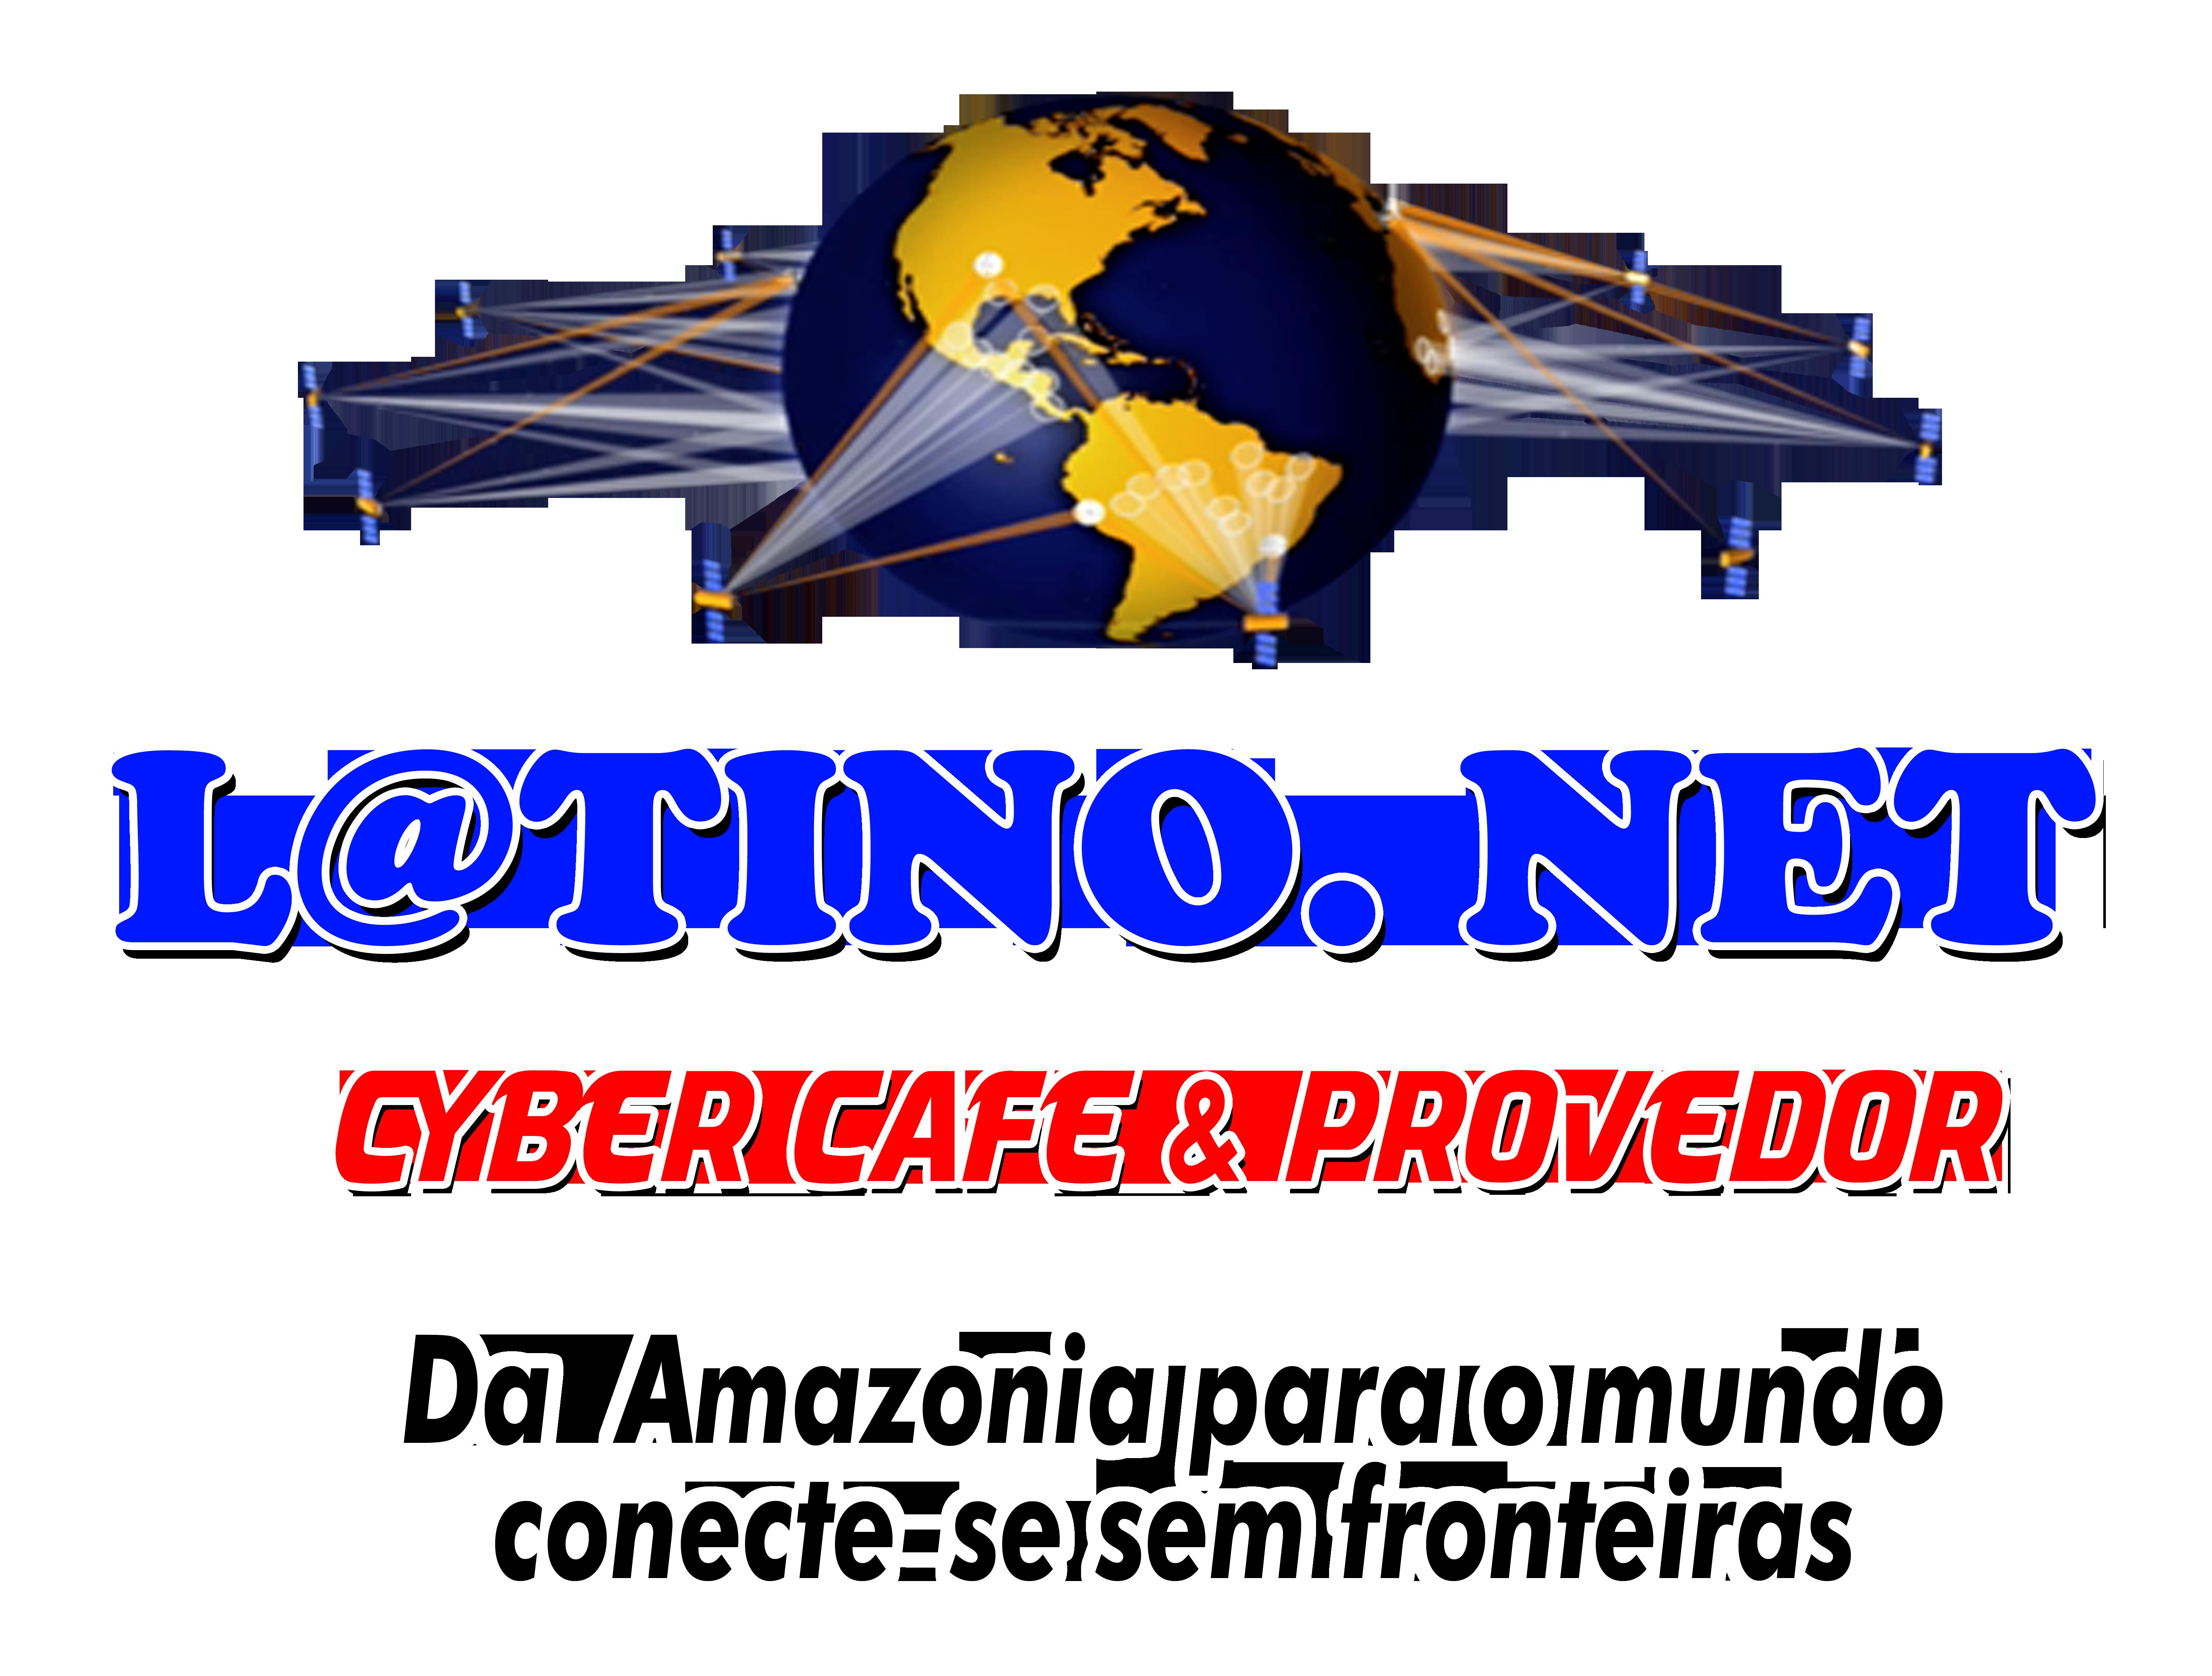 L@TINO.NET